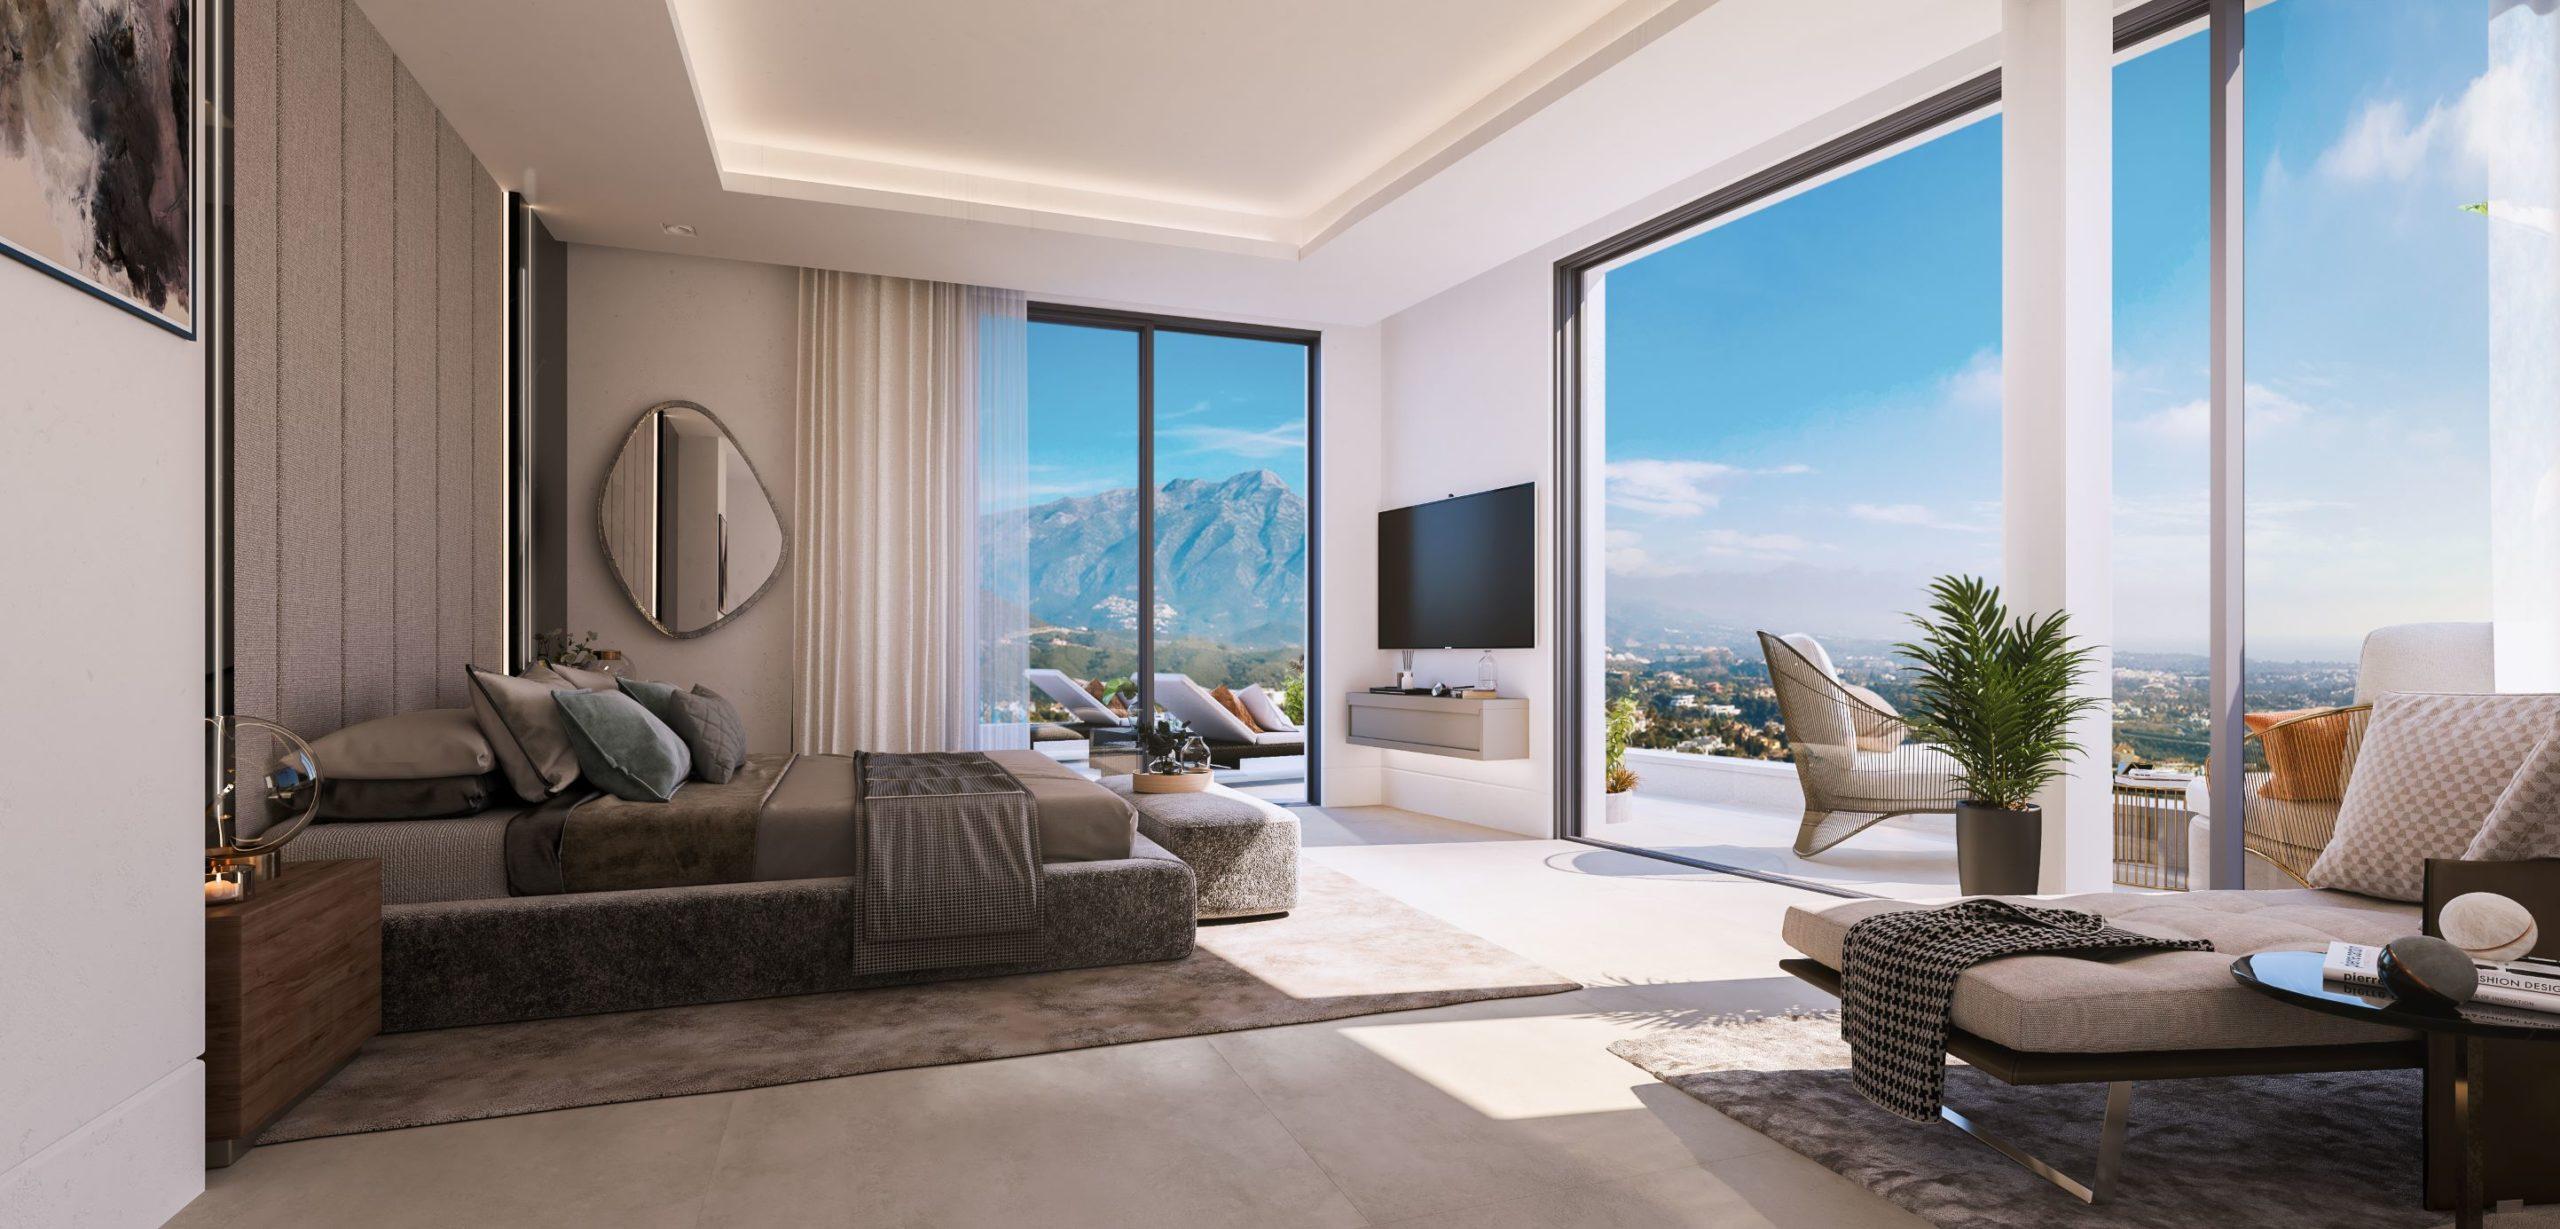 Grand View Marbella Bedroom